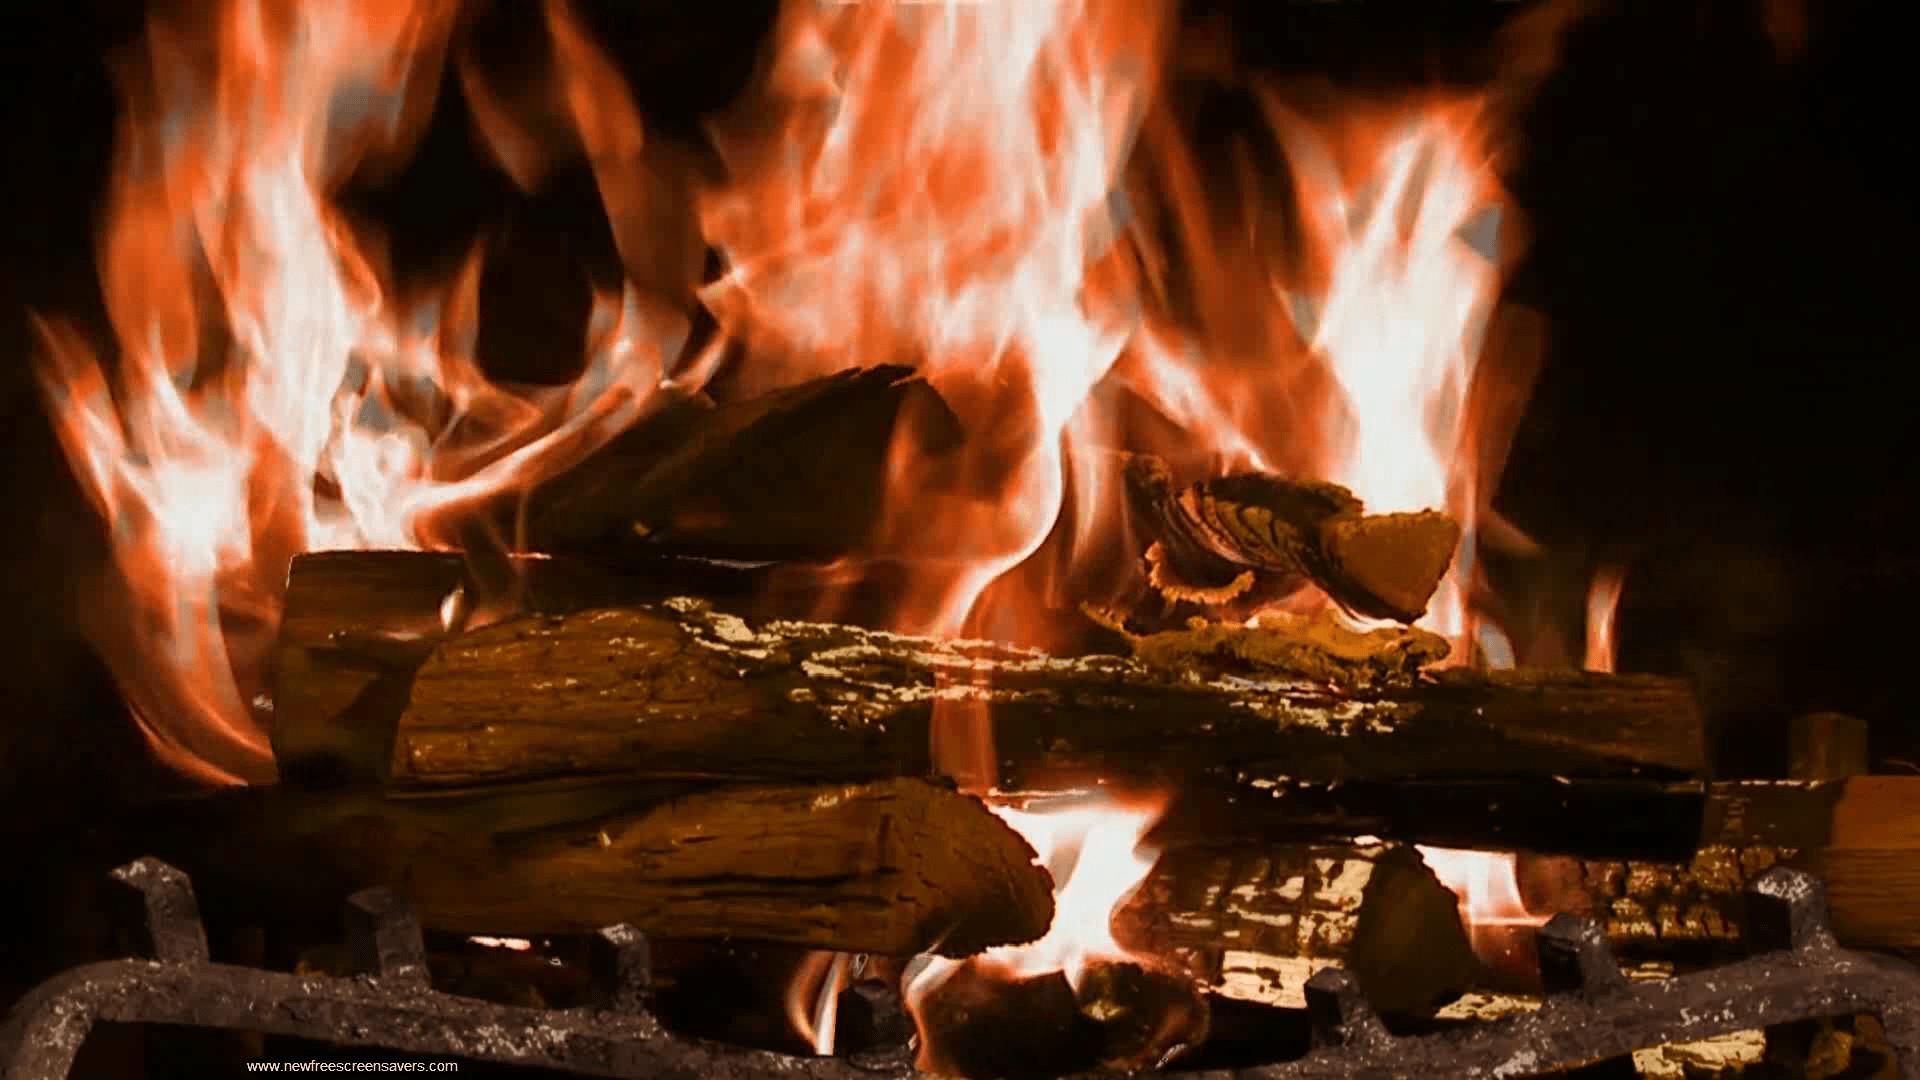 Free Desktop Wallpaper Fire: Fireplace Desktop Wallpaper ·①